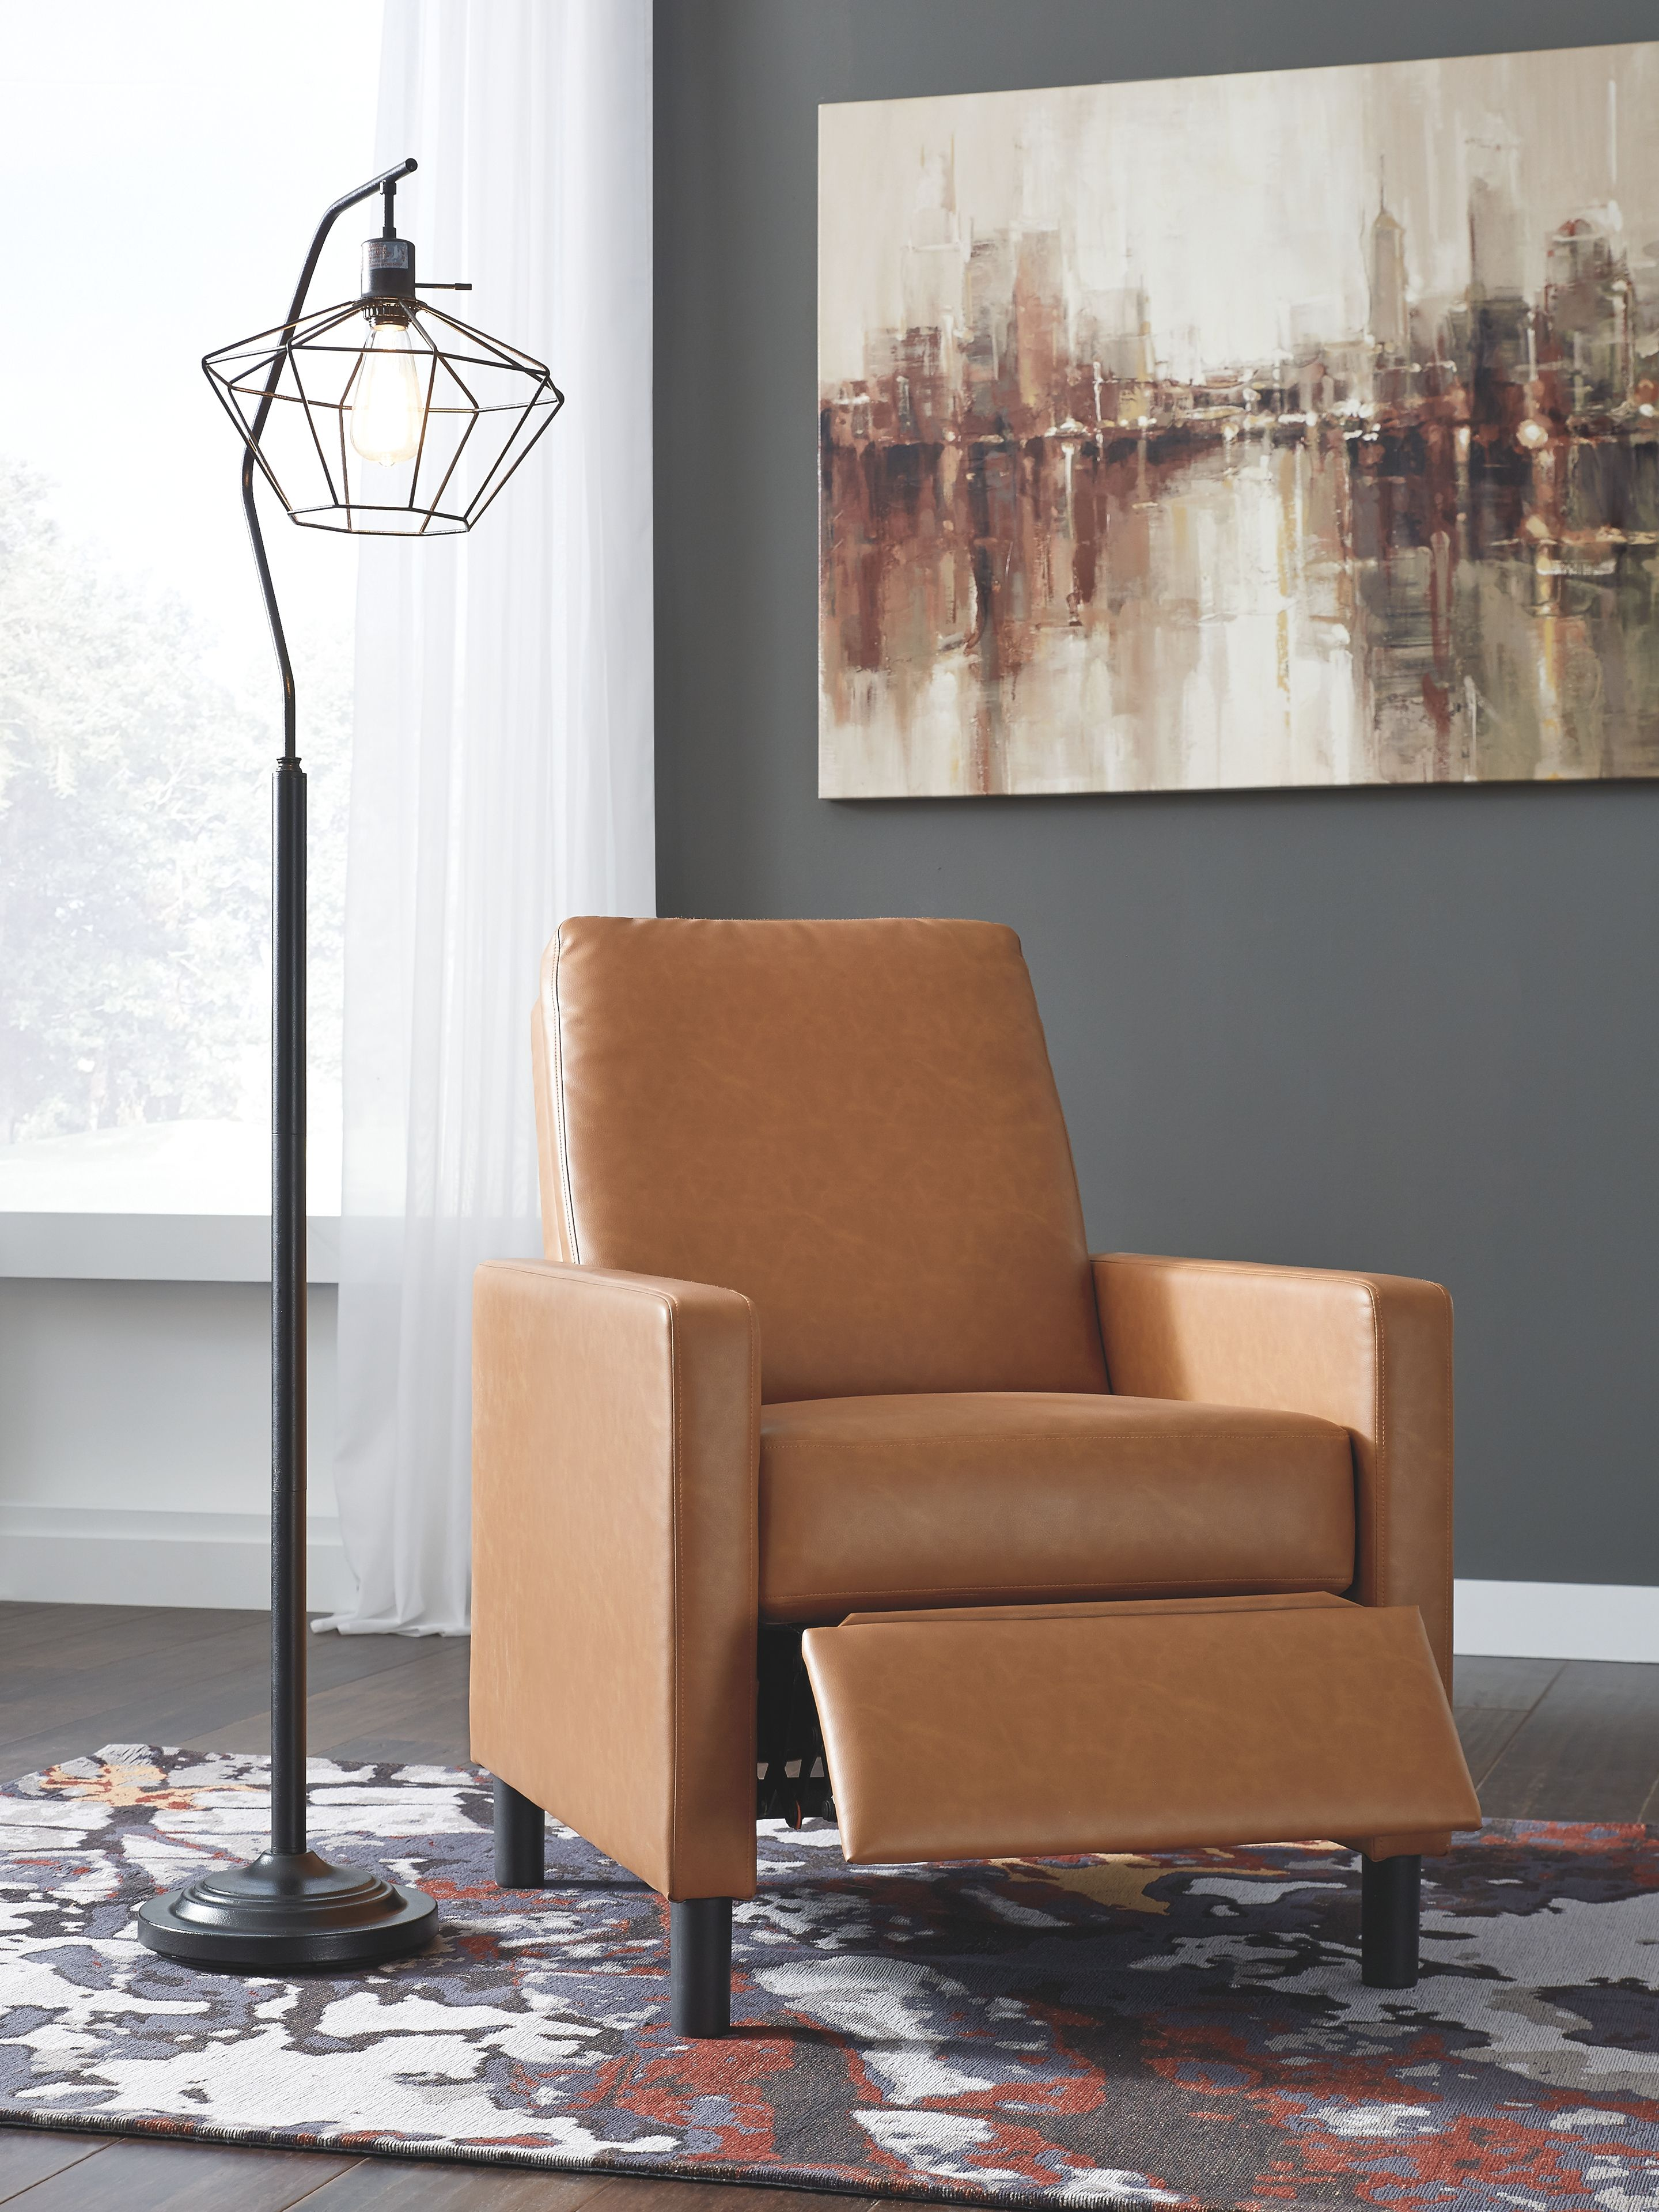 Hemmoor Recliner Ashley Furniture Homestore High Leg Recliner Stylish Chairs Recliner